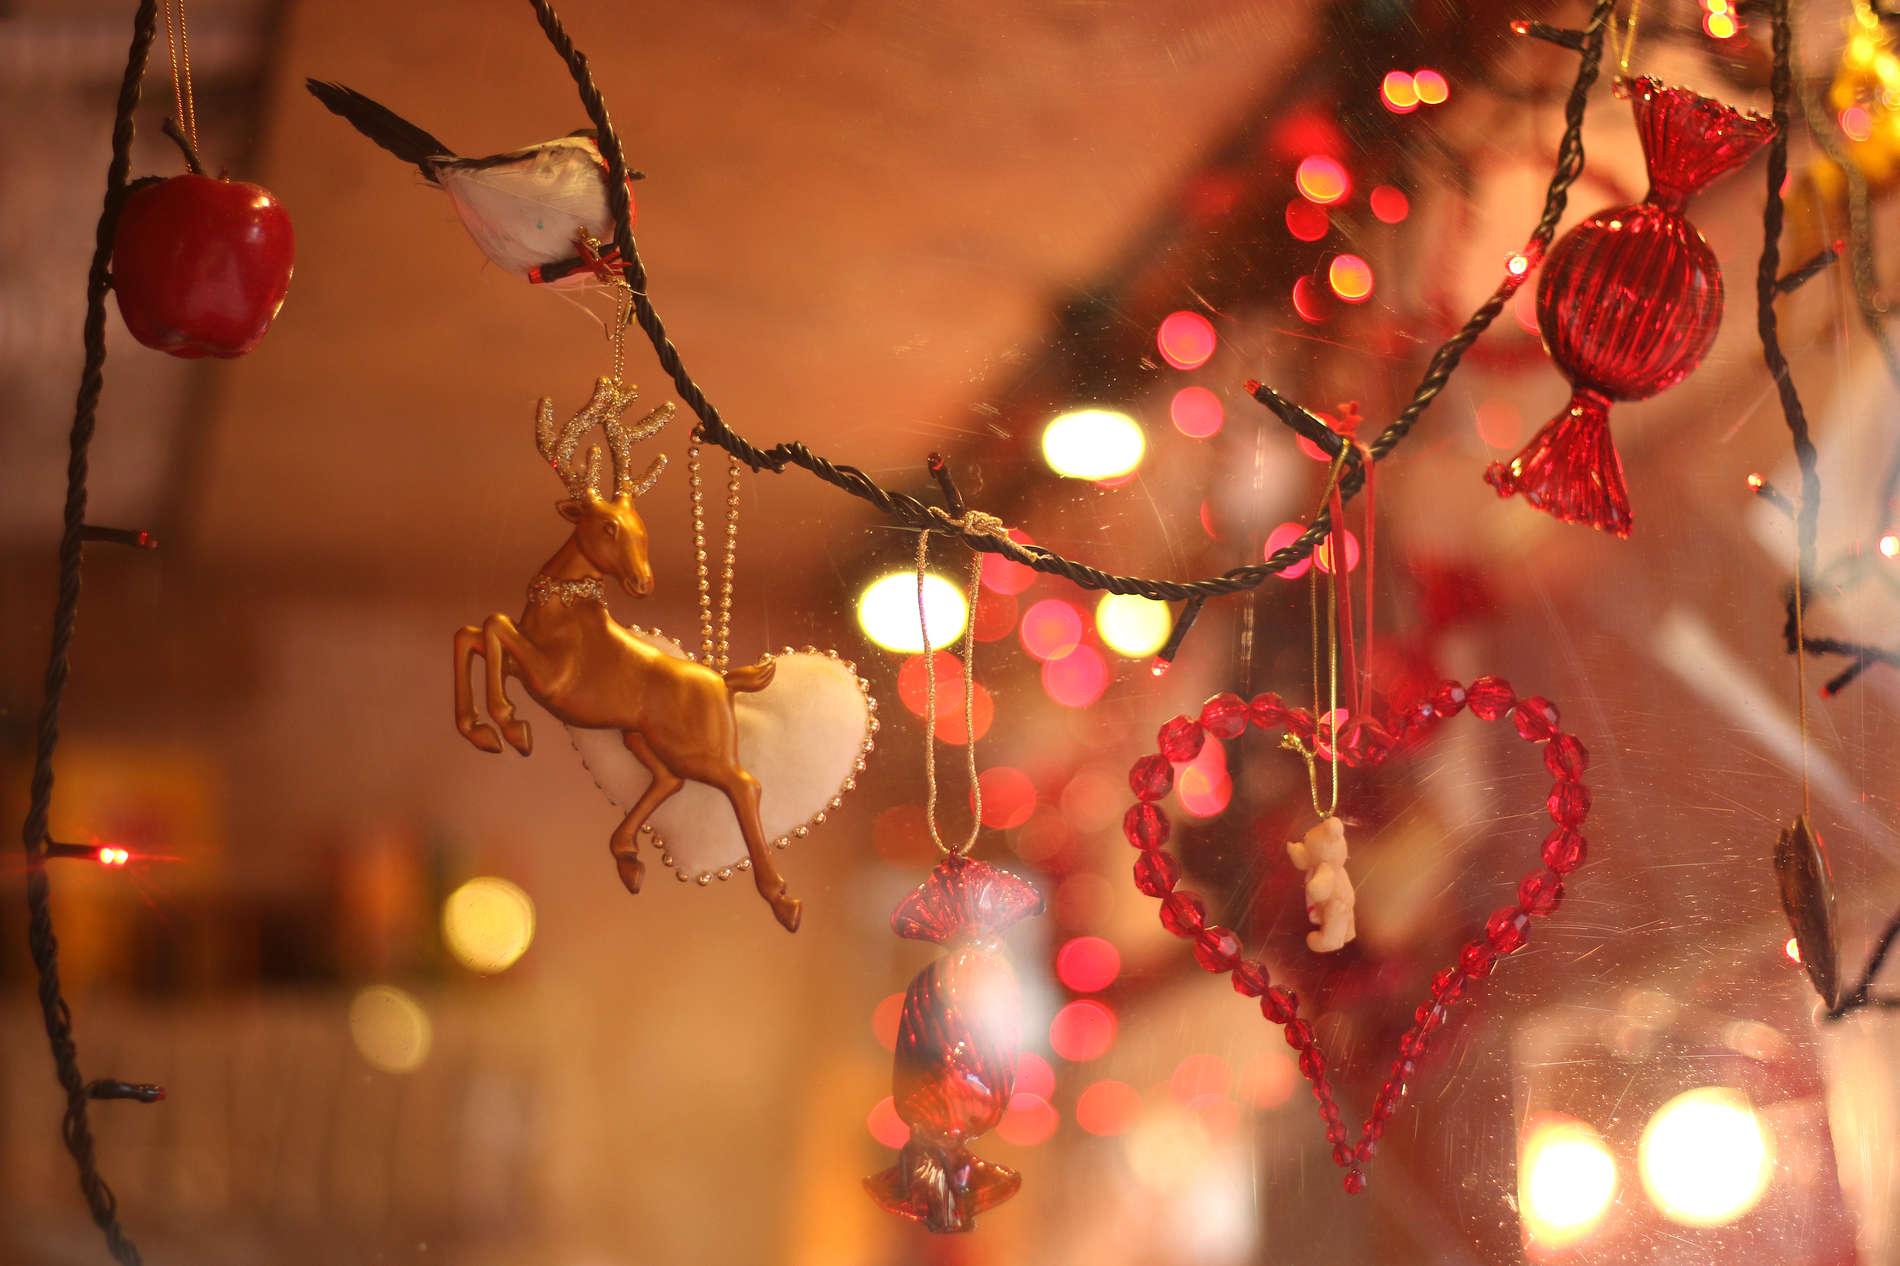 Christmas decorations at Tallinn Christmas Market in Estonia. Photo by: Kadi-Liis Koppel